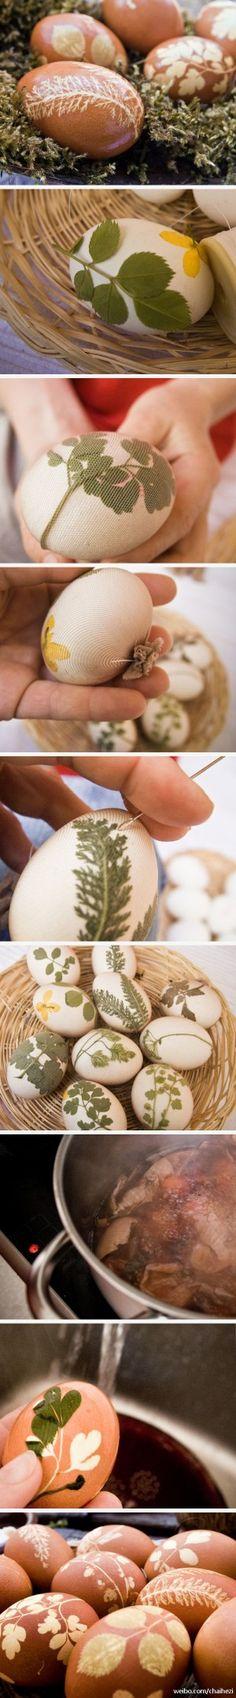 DIY & Tutorial : How to create Easter egg art Easter Egg Dye, Easter Egg Crafts, Hoppy Easter, Easter Food, Easter Brunch, Diy Ostern, Easter Activities, Easter Holidays, Egg Decorating